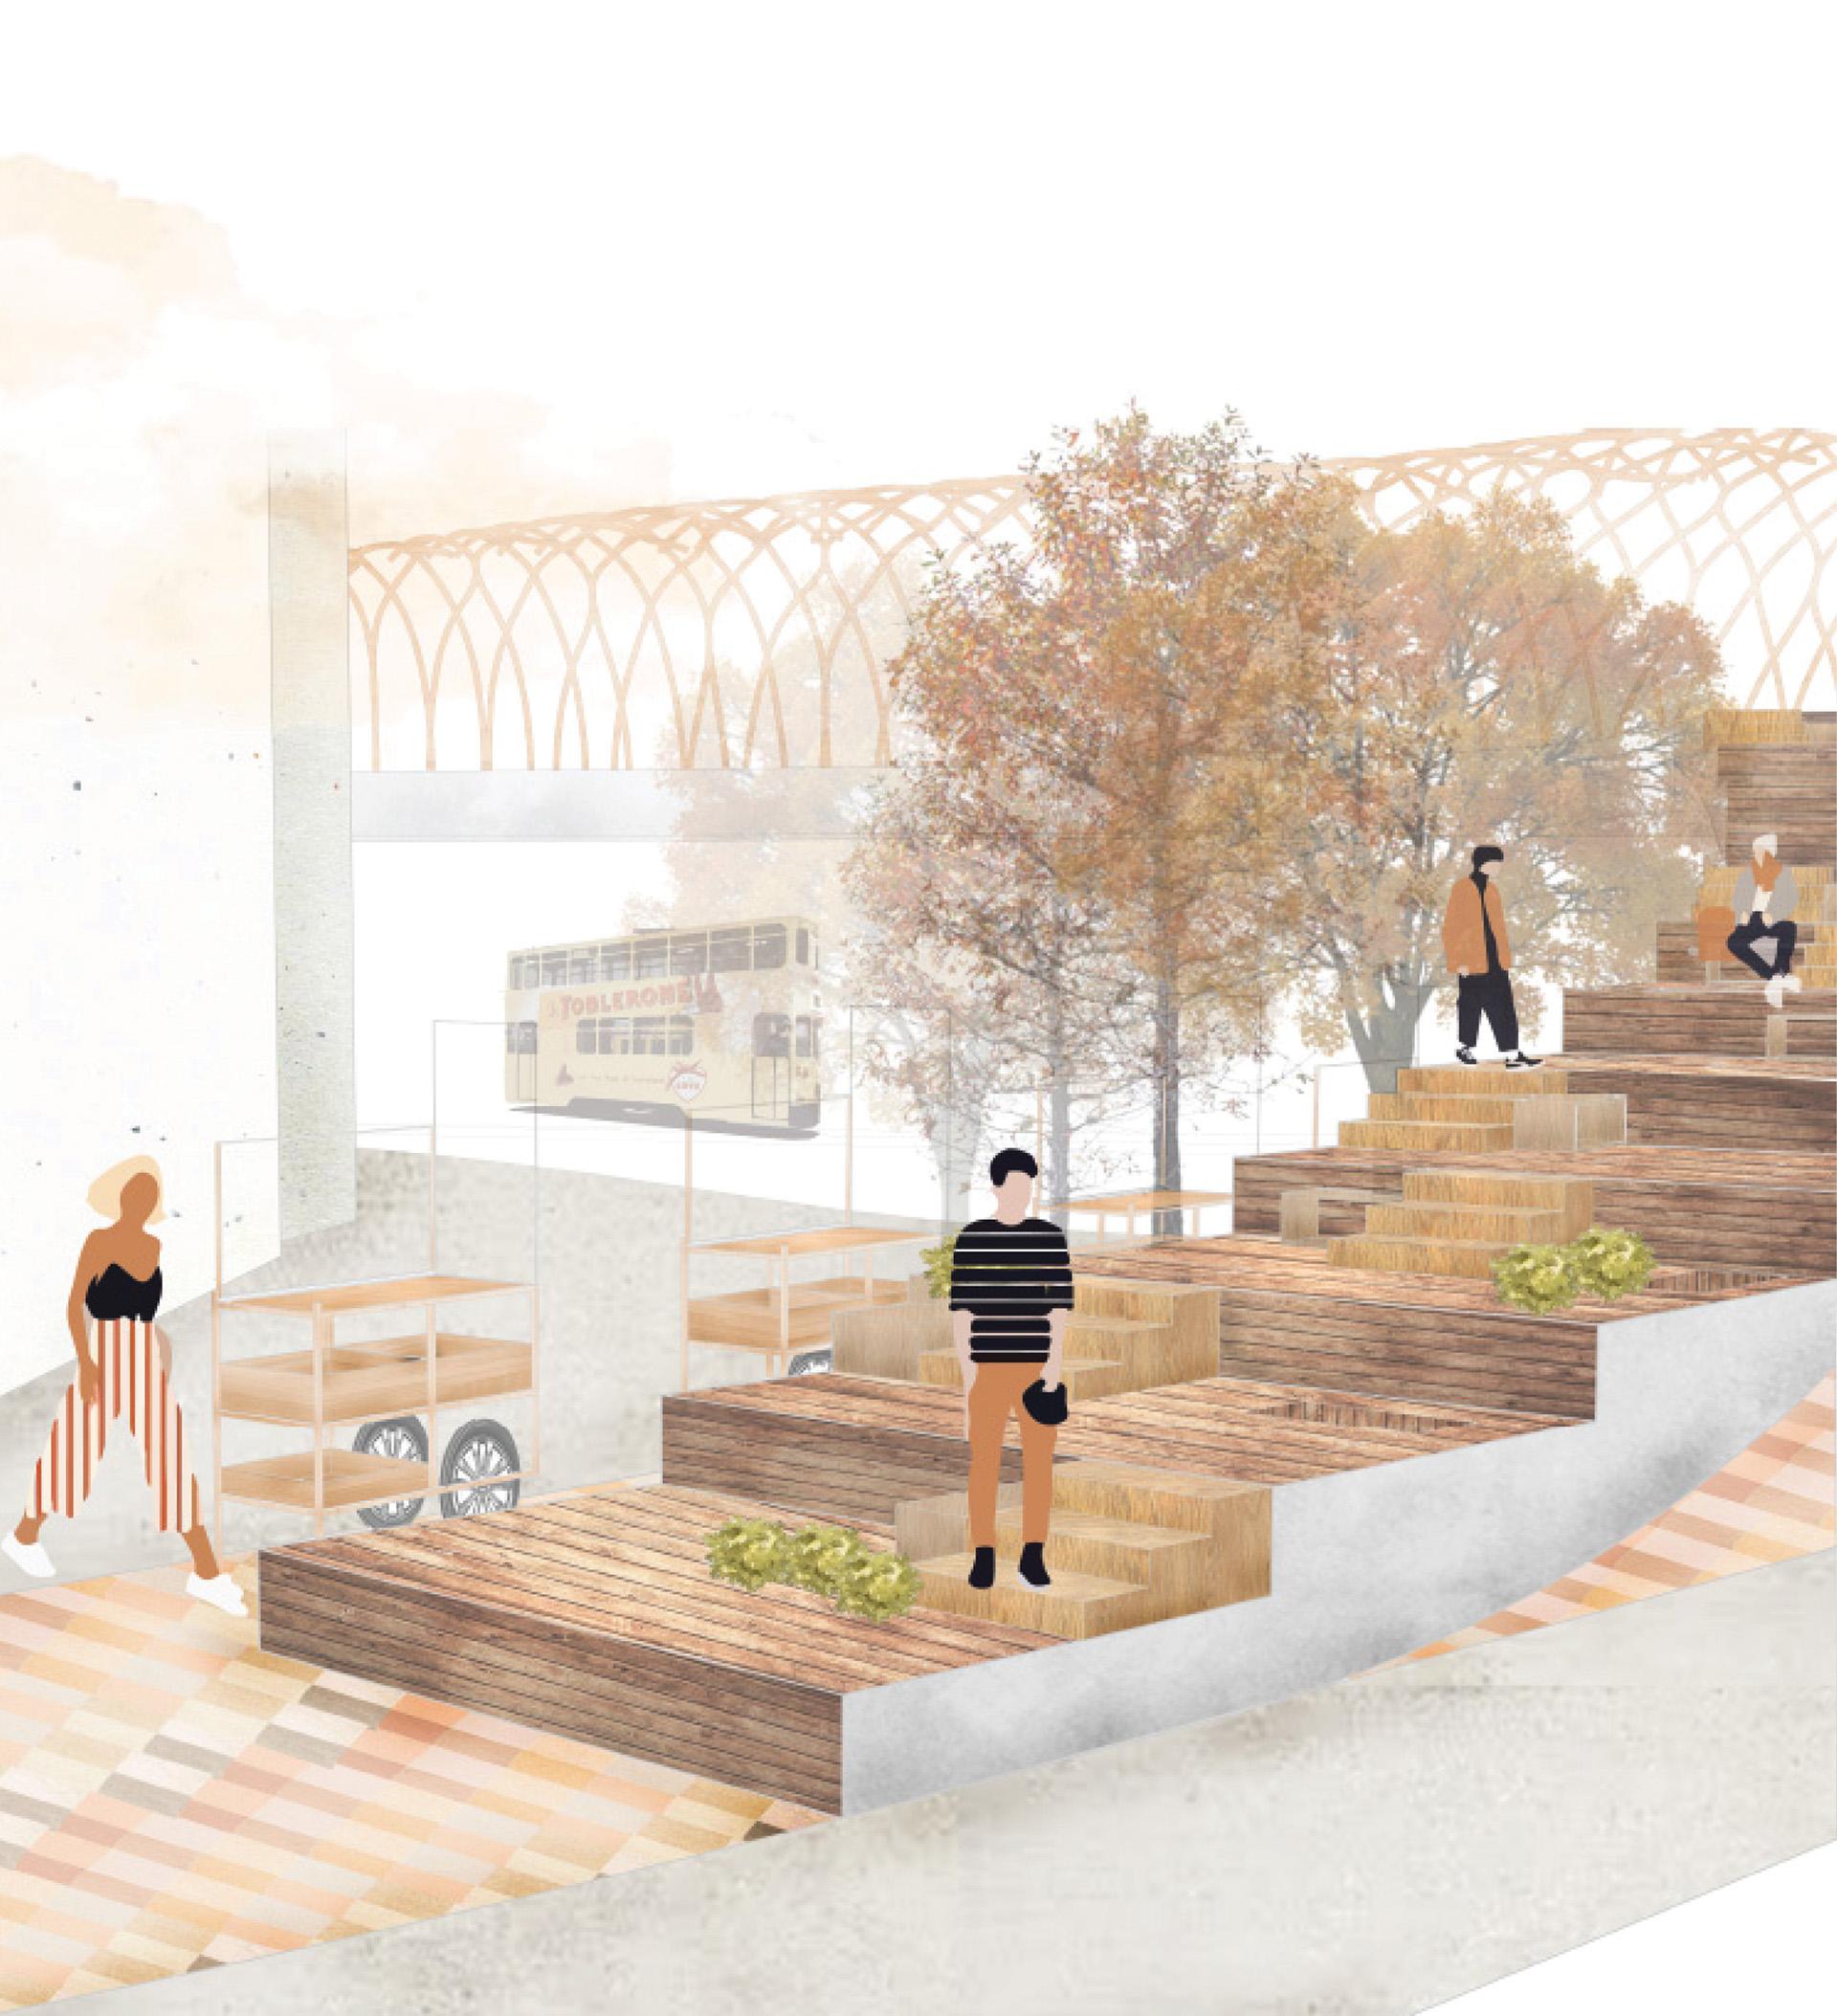 Enlarge Photo: Final project 'The Common Bridge'. By MAK Sum Yuet Faustine .